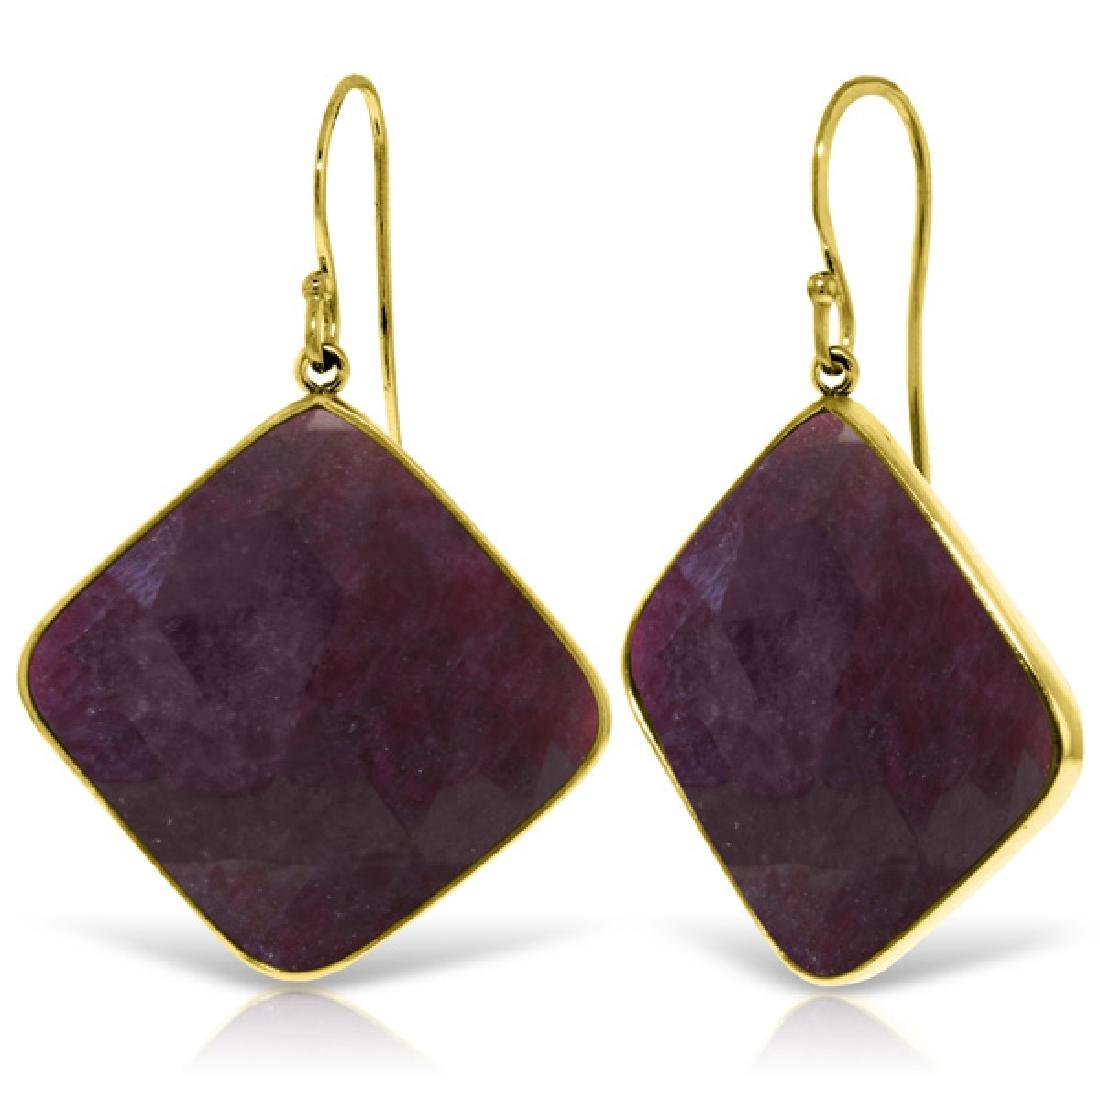 Genuine 40.5 ctw Ruby Earrings Jewelry 14KT Yellow Gold